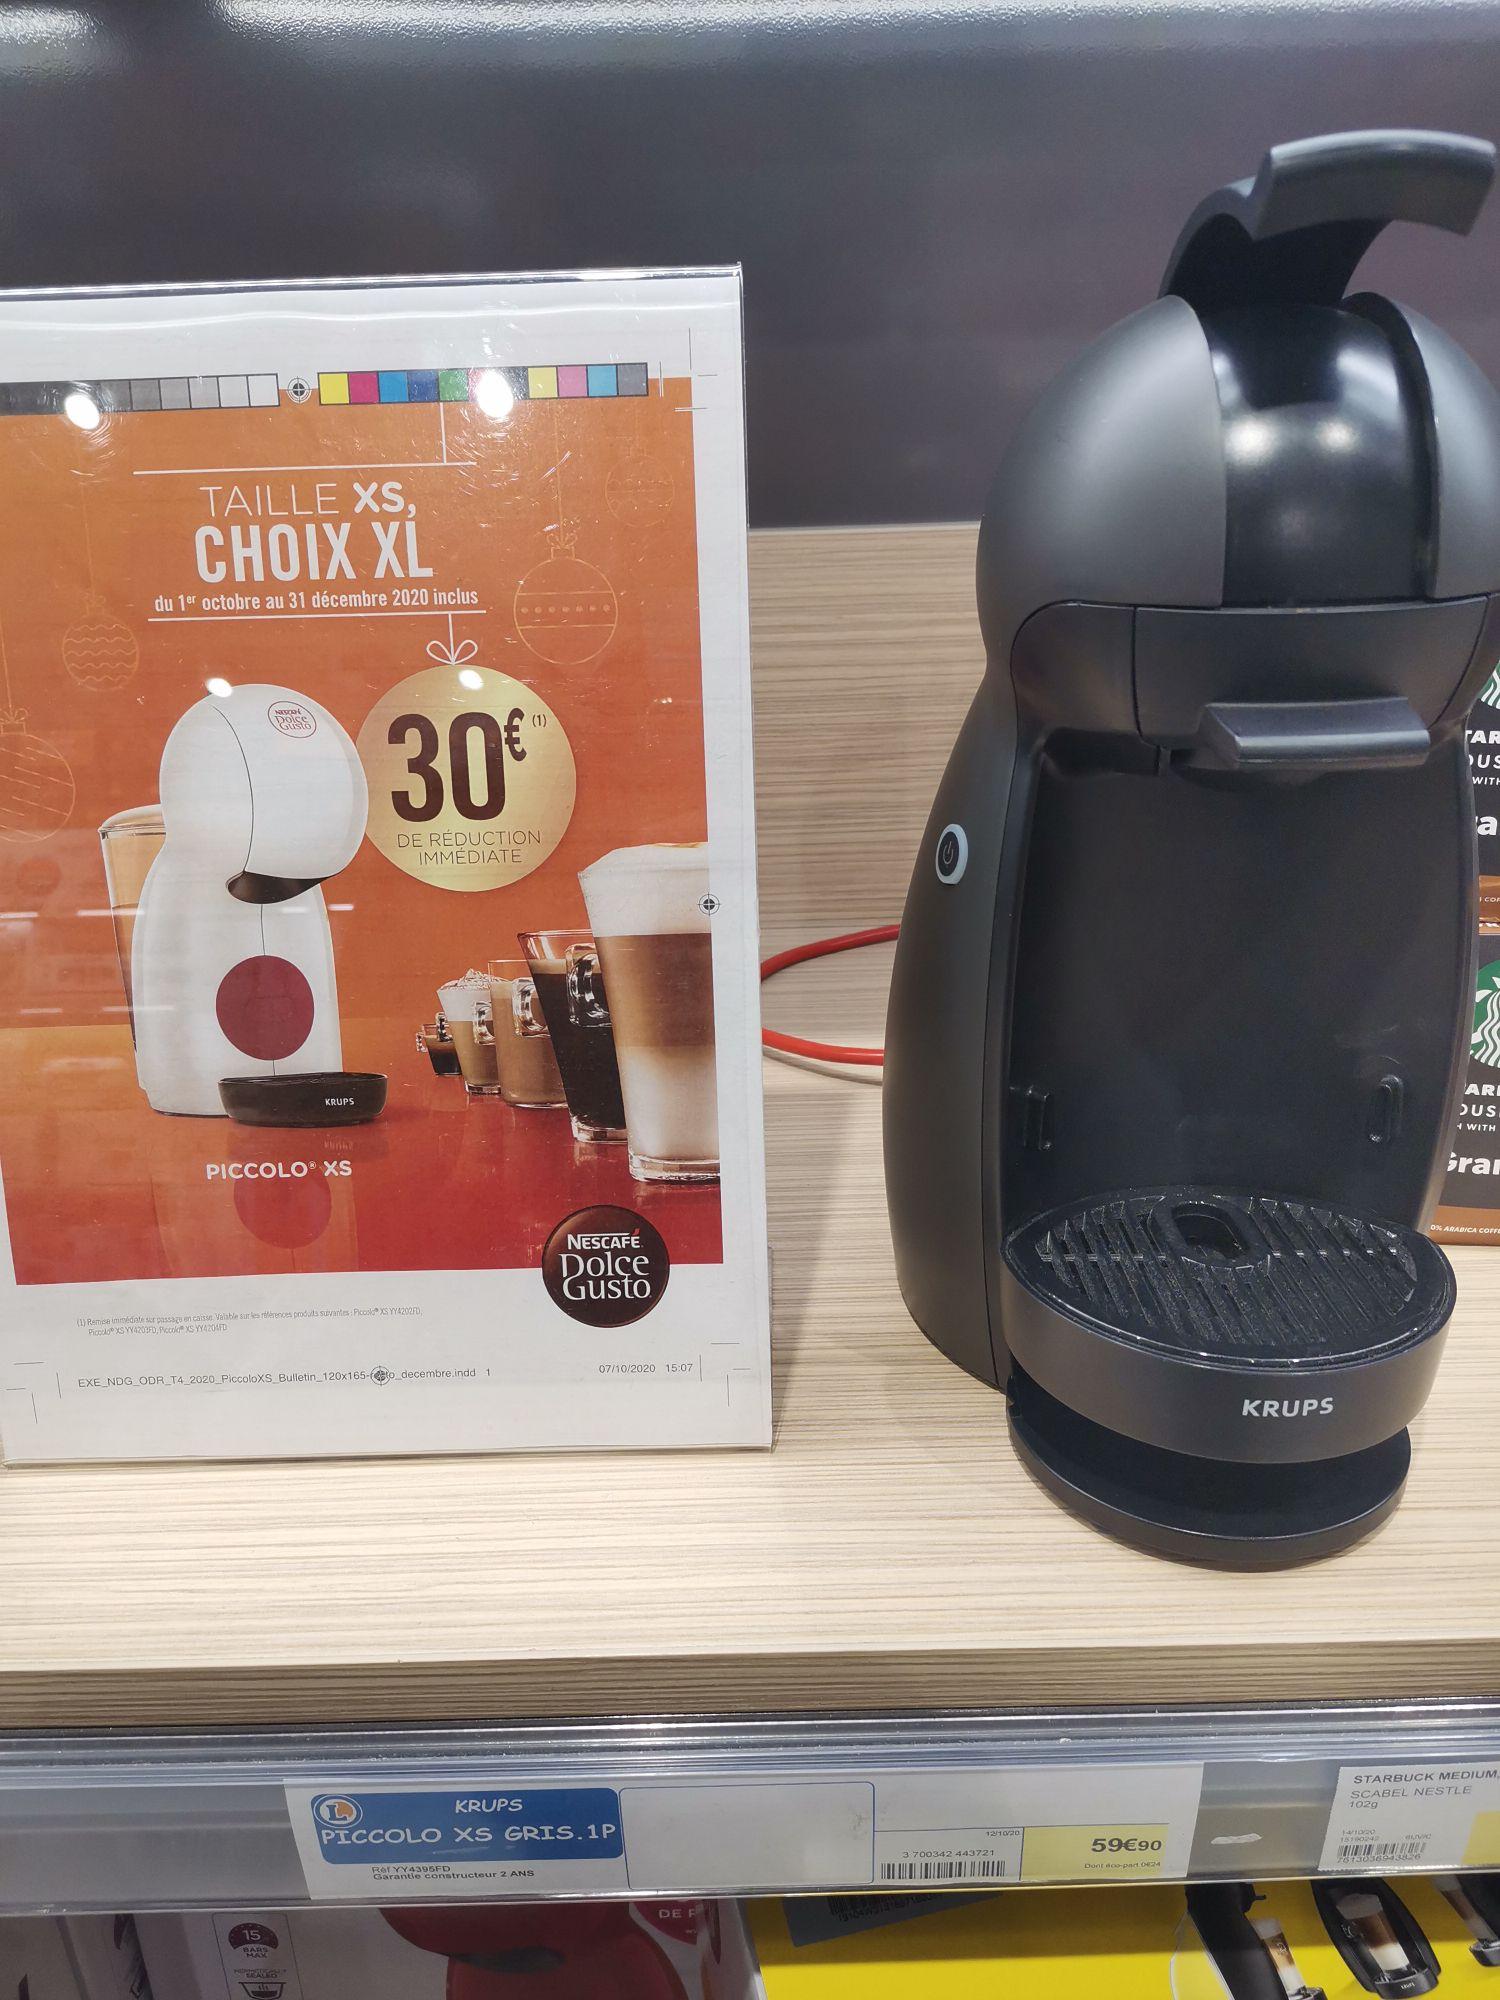 Machine à café Krups Dolce Gusto Piccolo XS - Rueil-Malmaison (92)